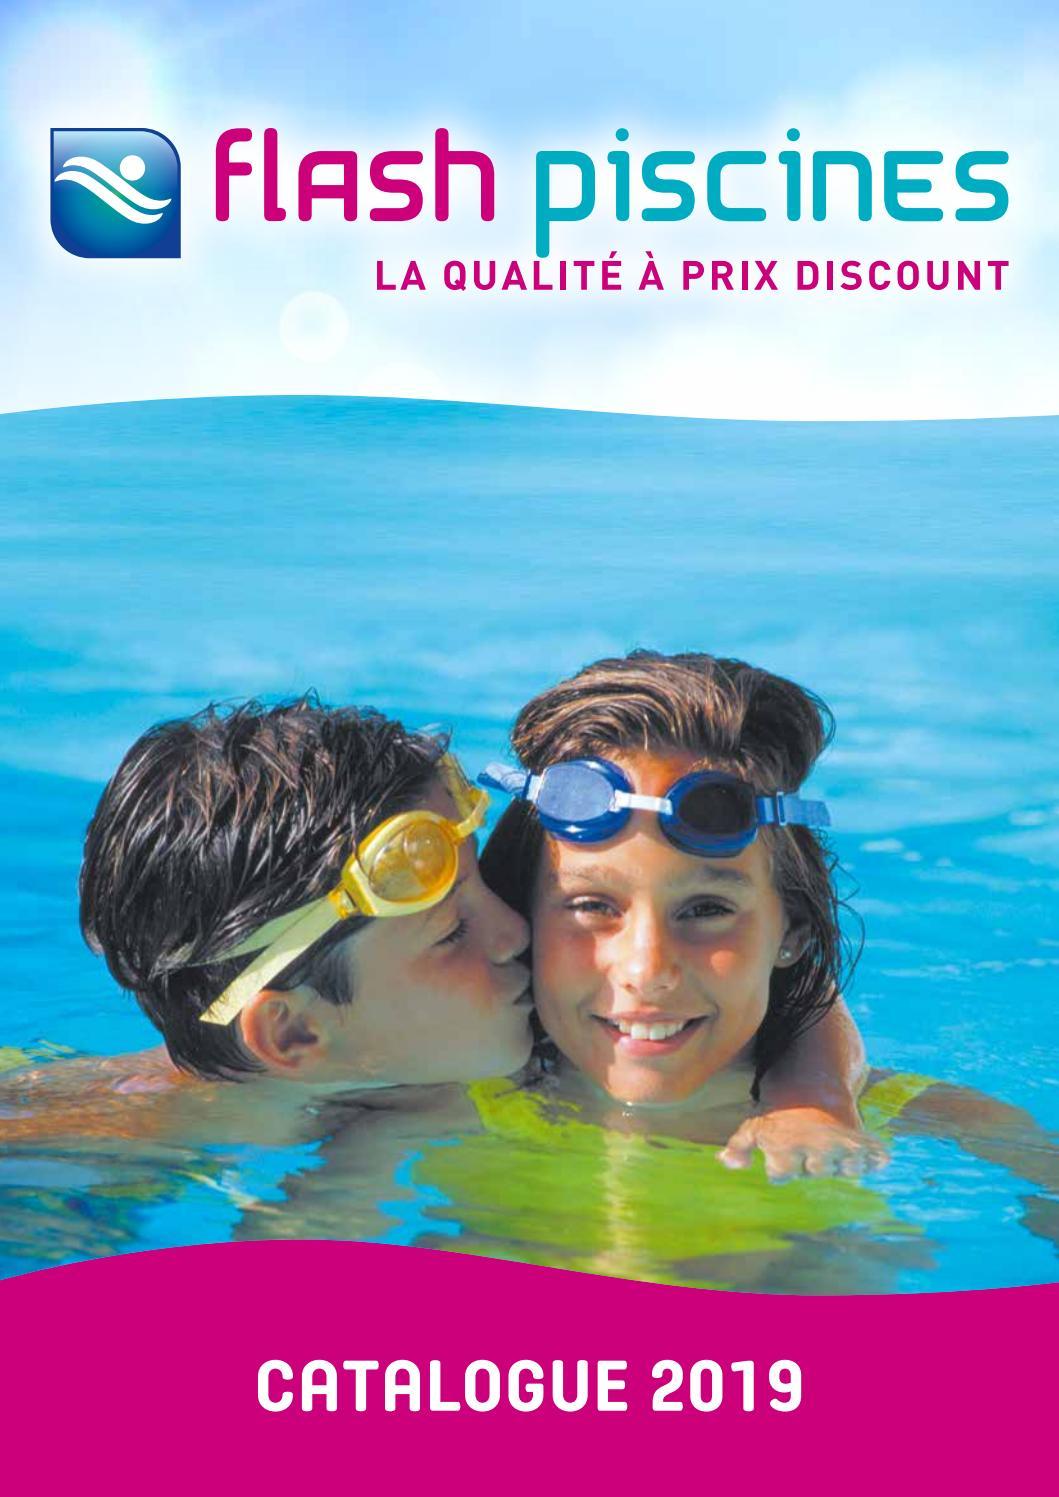 Catalogue Flash Piscines 2019 By Flash.piscines - Issuu pour Flash Piscine